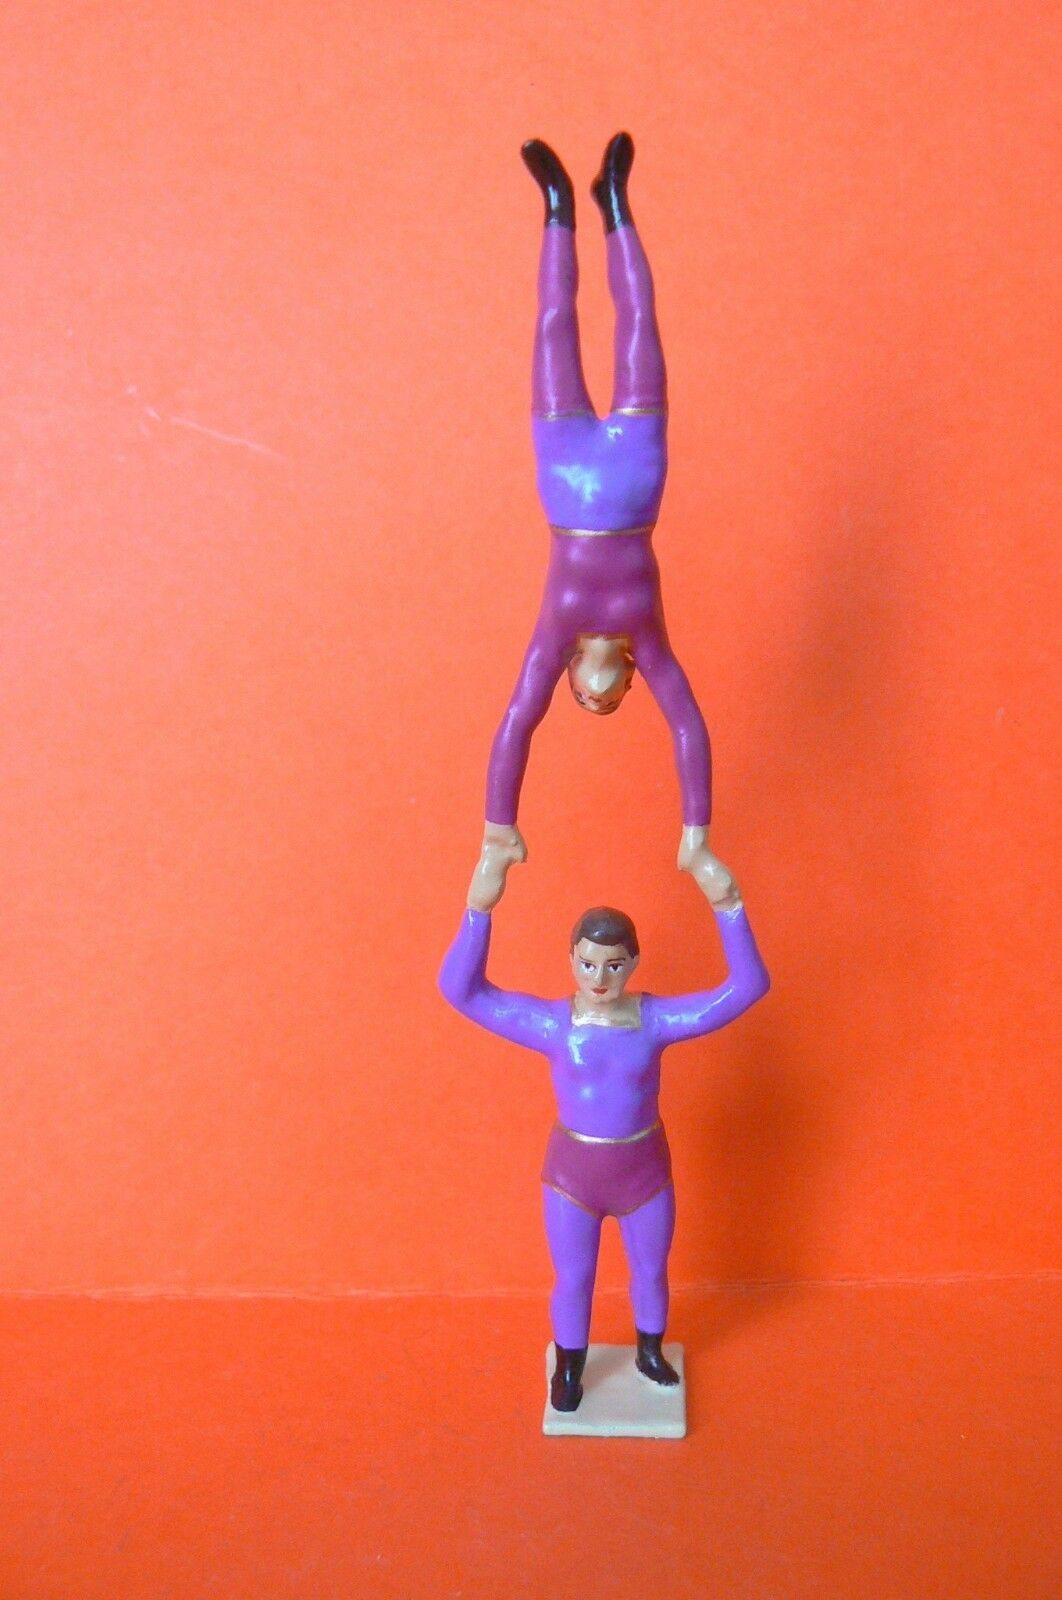 Cbg Mignot  Circo, Novità  Set De 2 Balancing Act